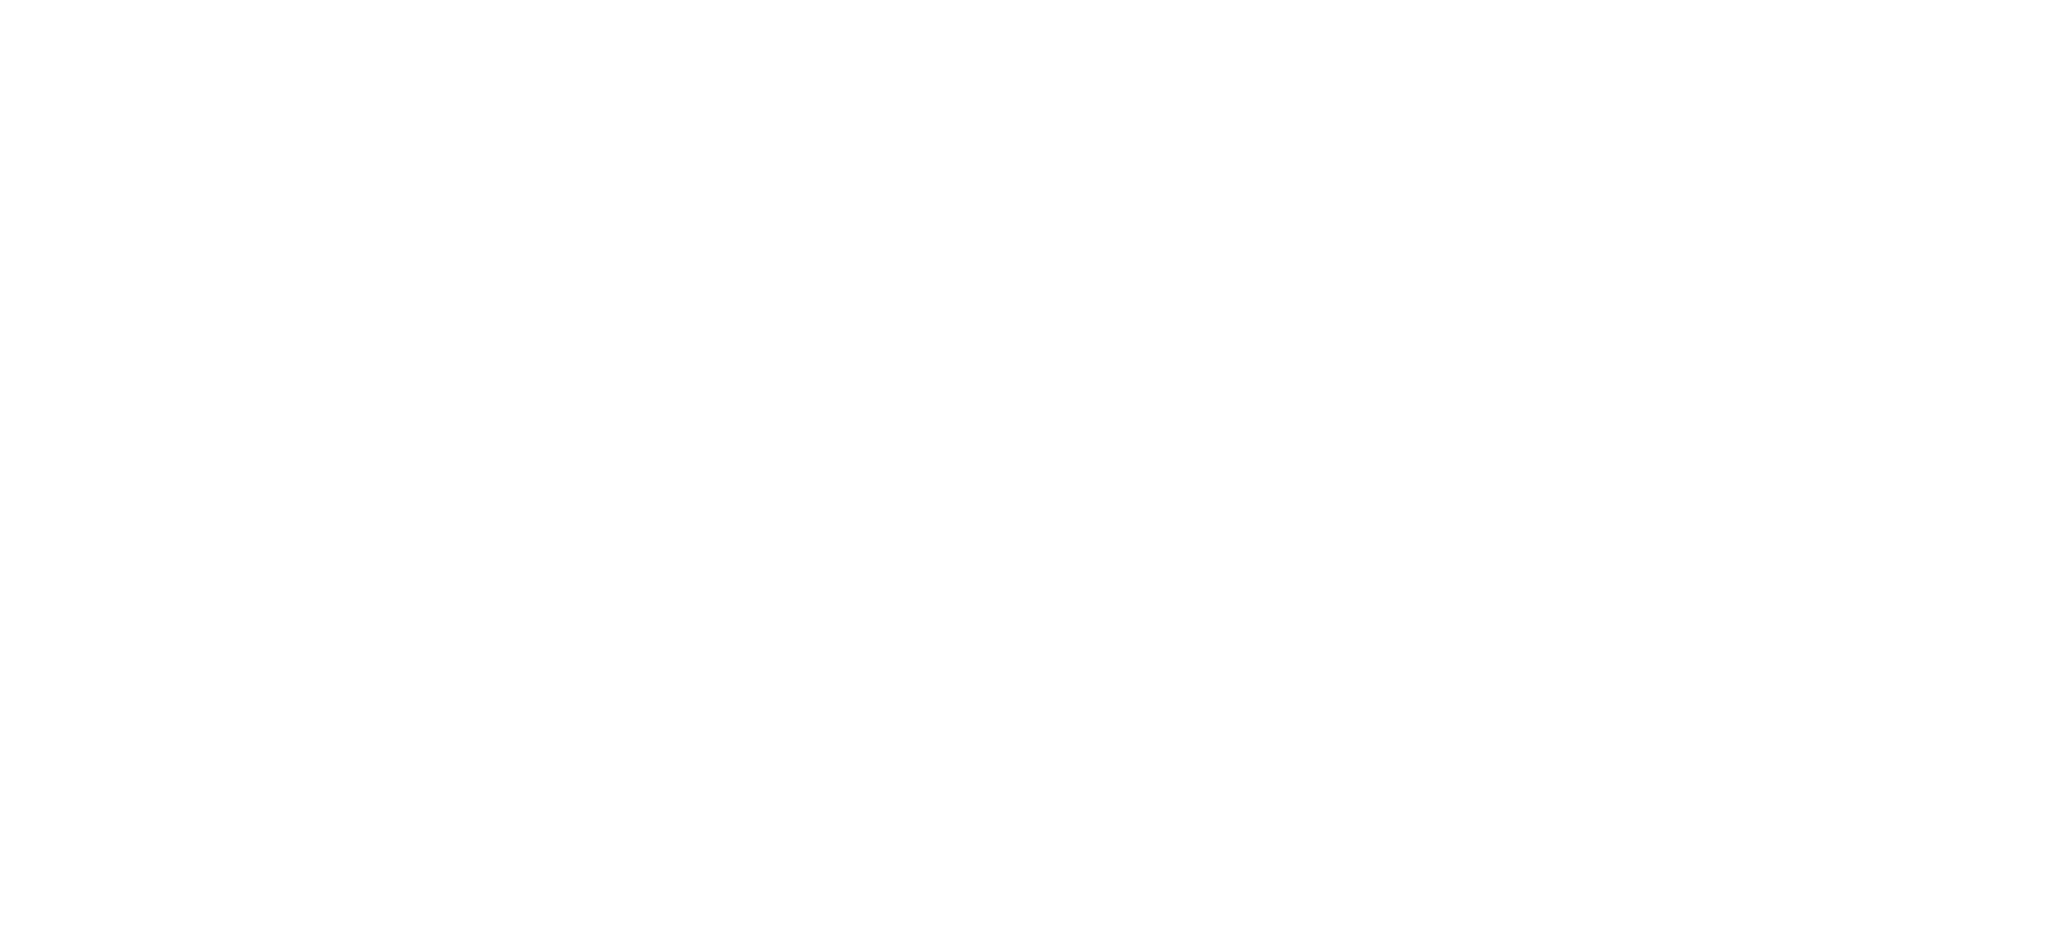 JCI 't Nieuwe Diep